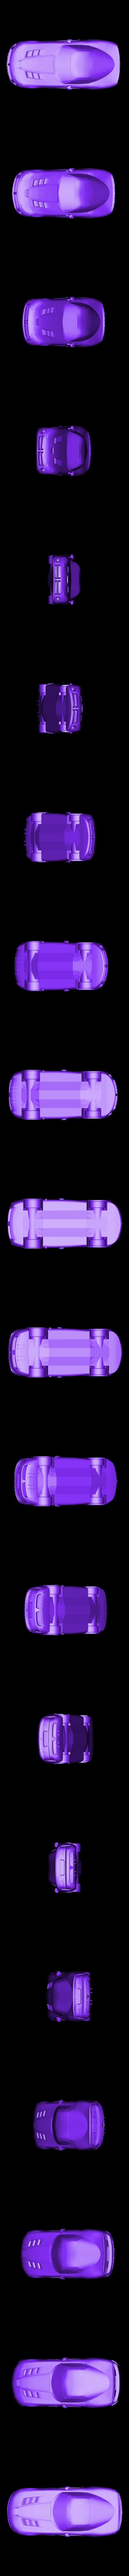 Dodge_Viper.stl Download free STL file Dodge Viper • 3D printable template, Bolrod